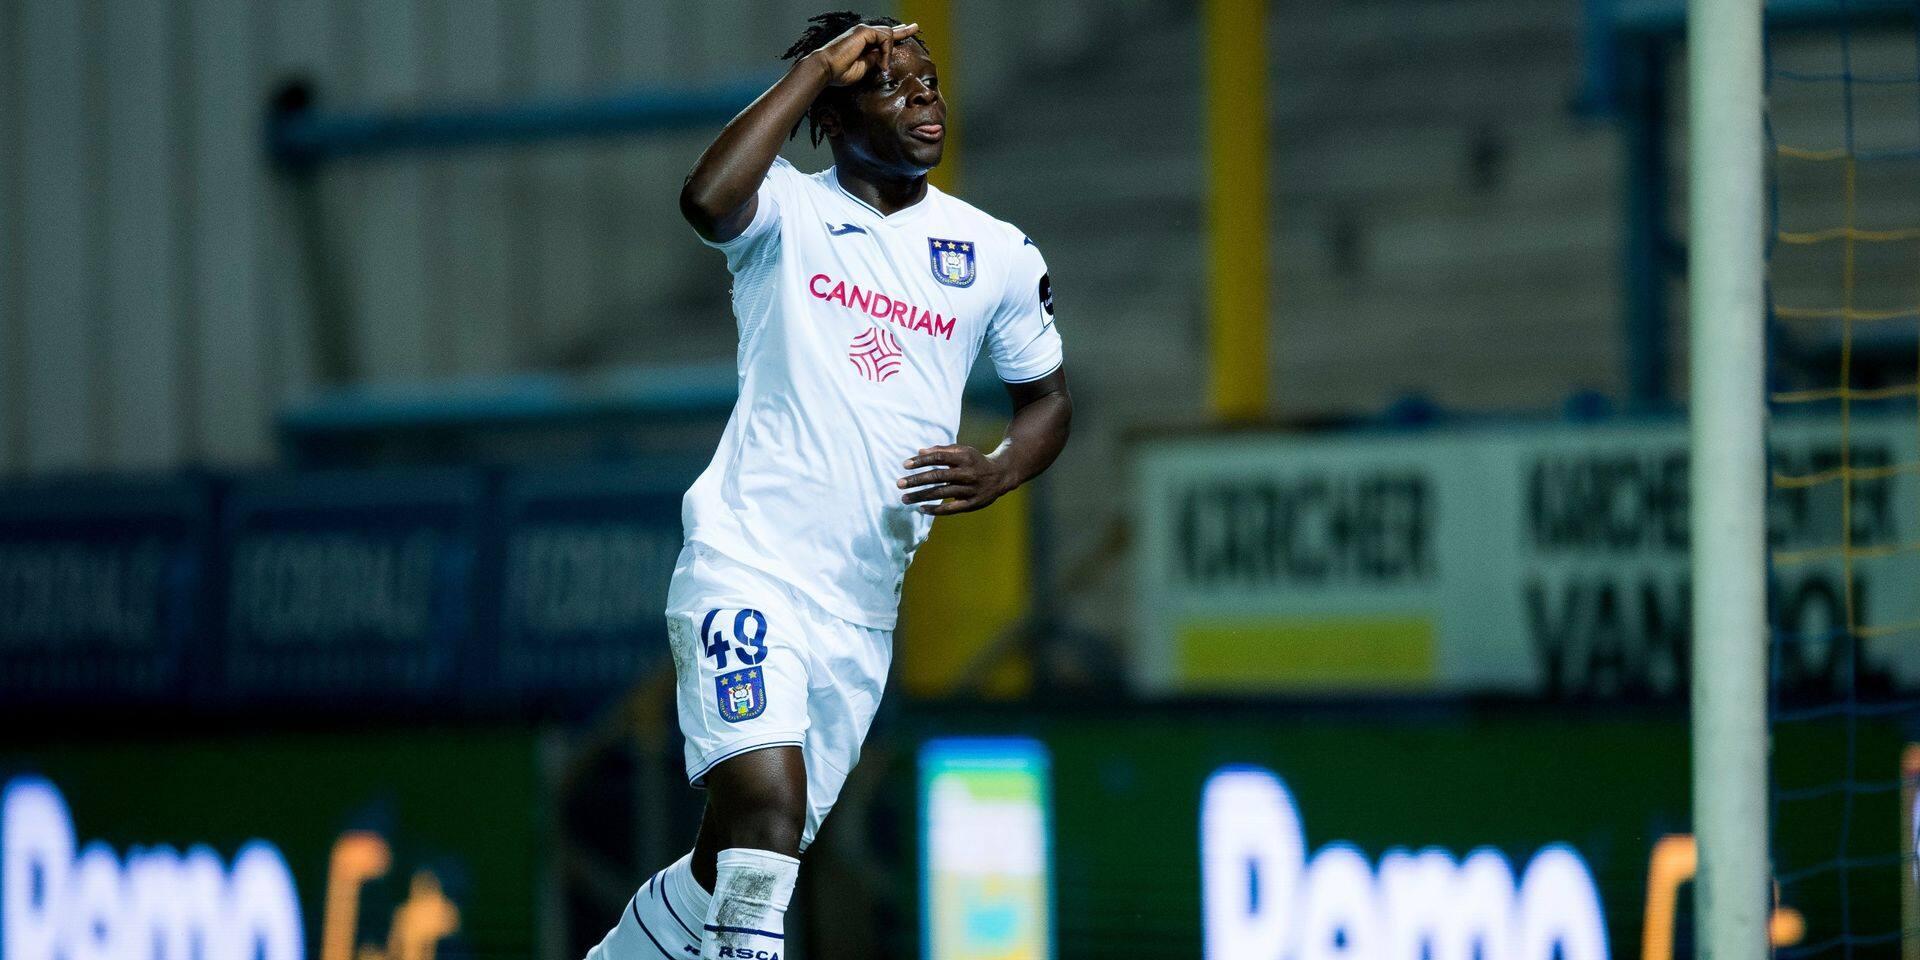 Doku, Amuzu, Dimata, Miazga: week-end de folie(s) au Sporting d'Anderlecht